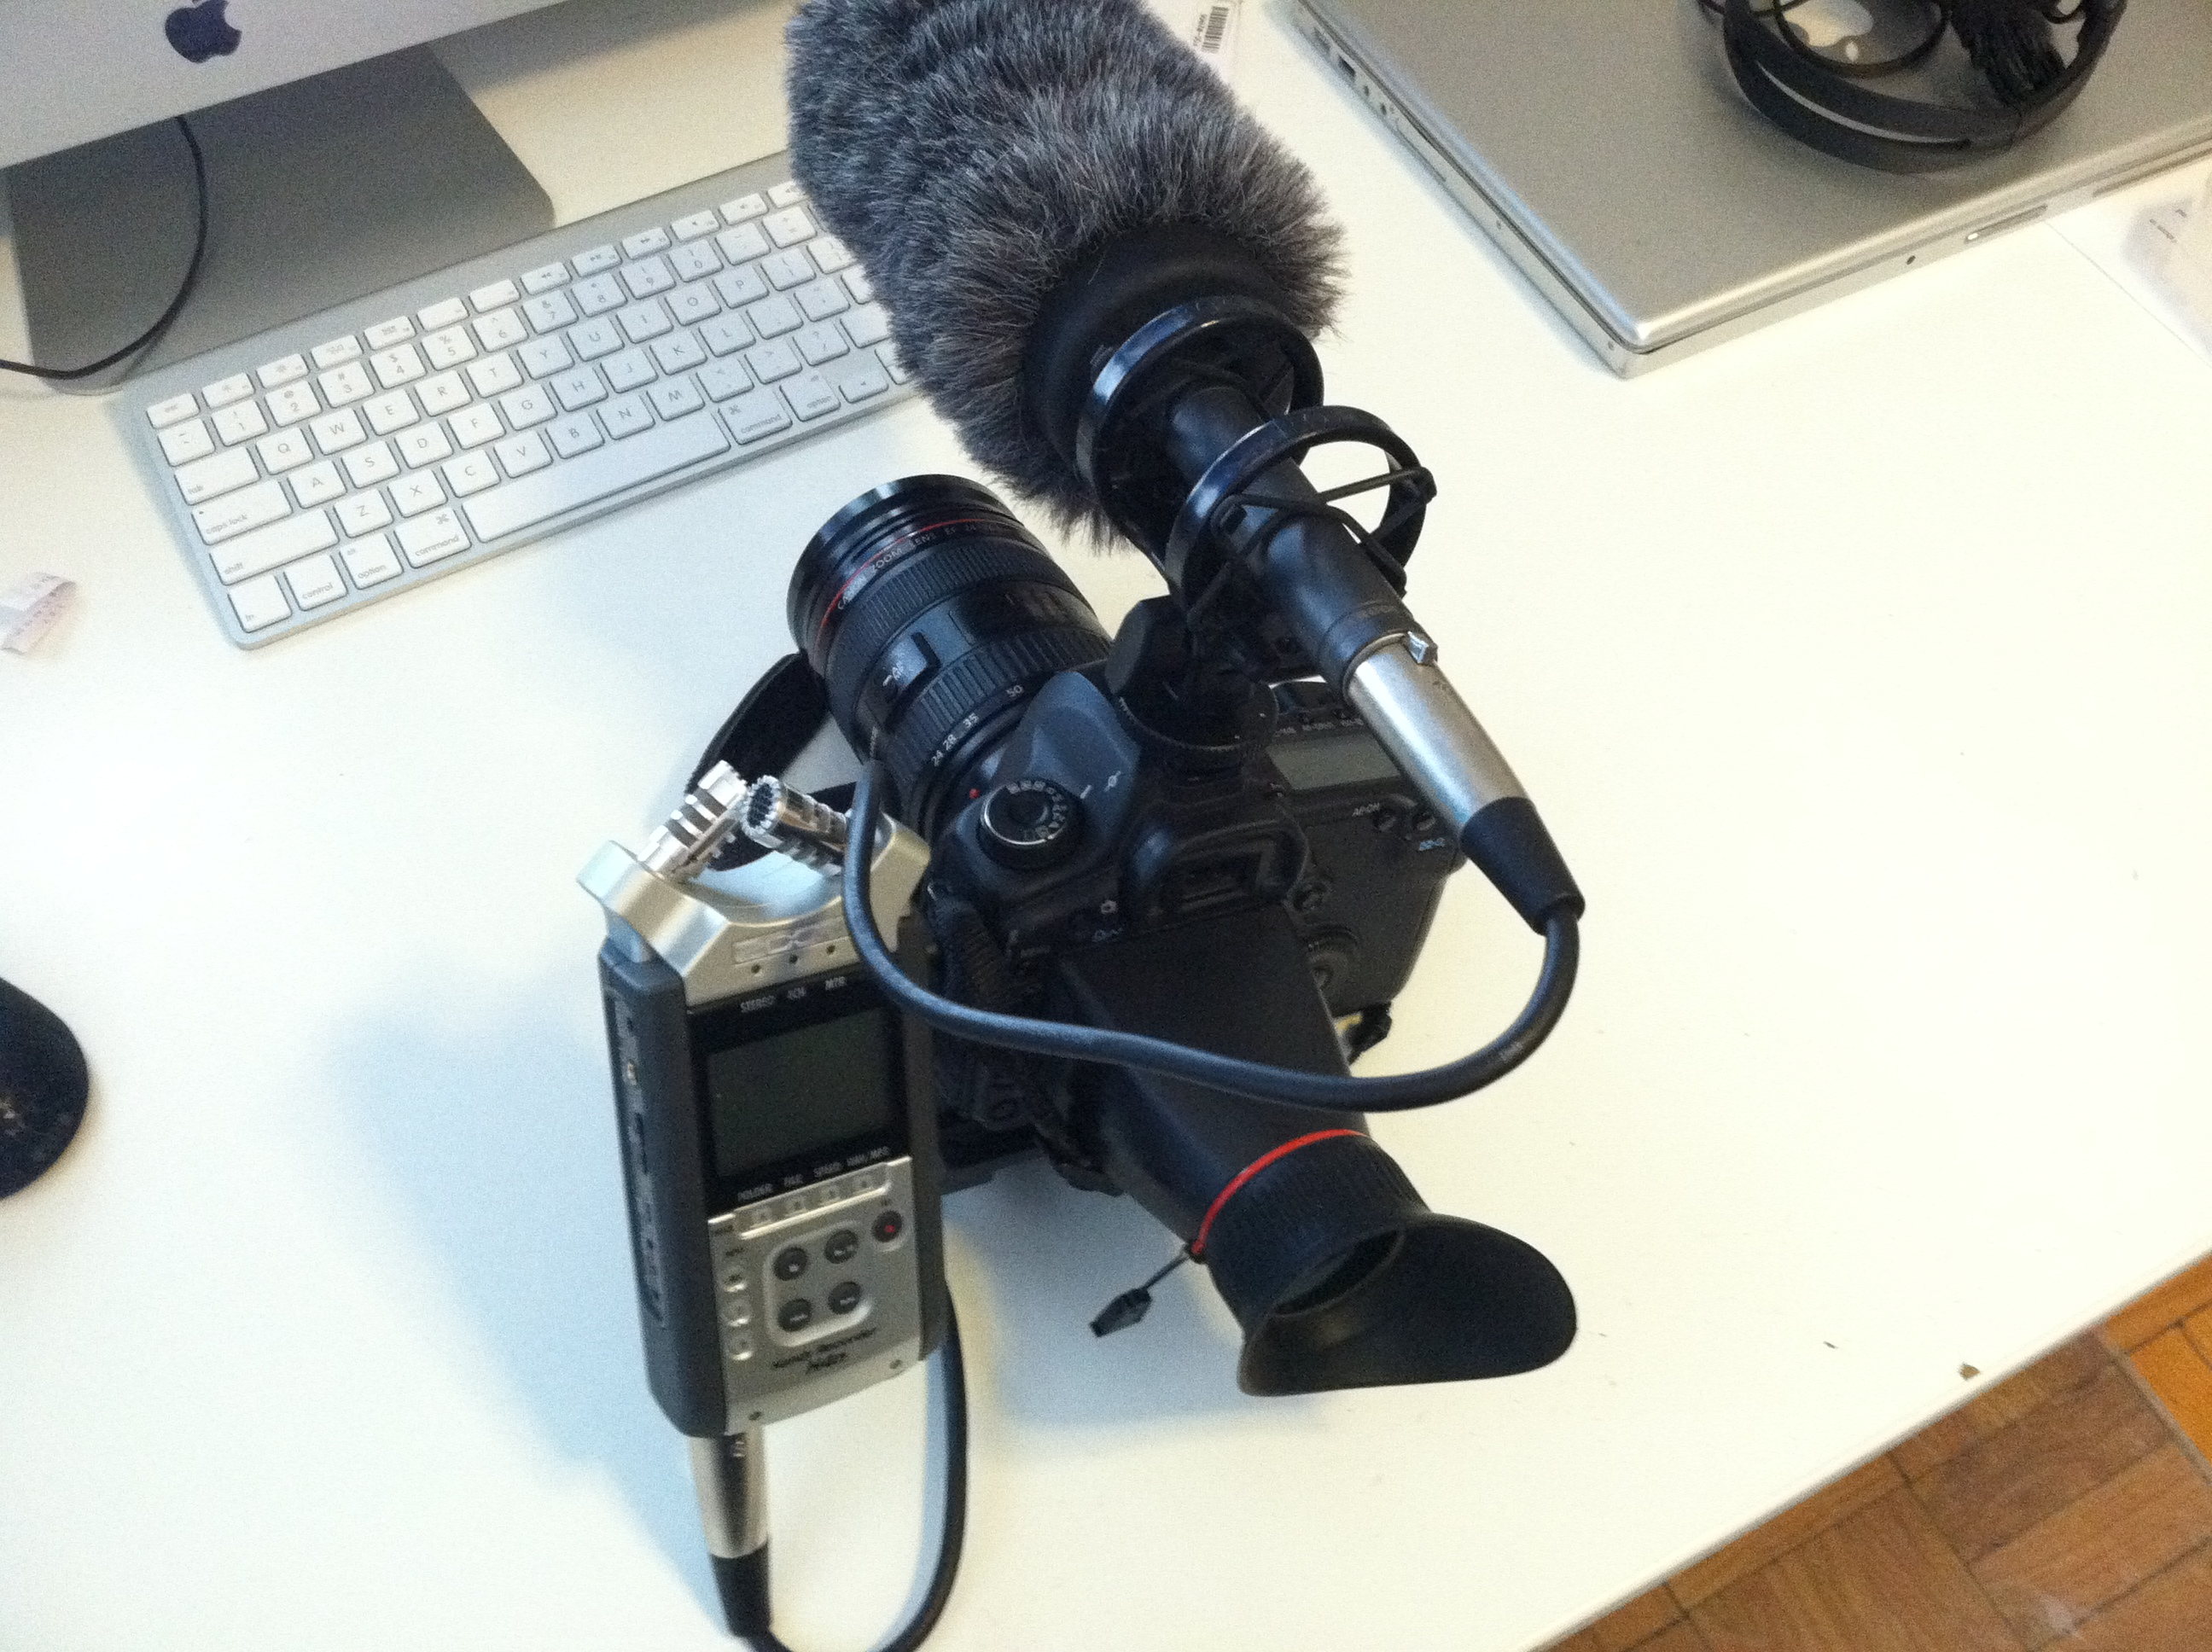 Camera Diy Dslr Camera Rig diy run n gun dslr video rig samuel corum photography img 1489 rig